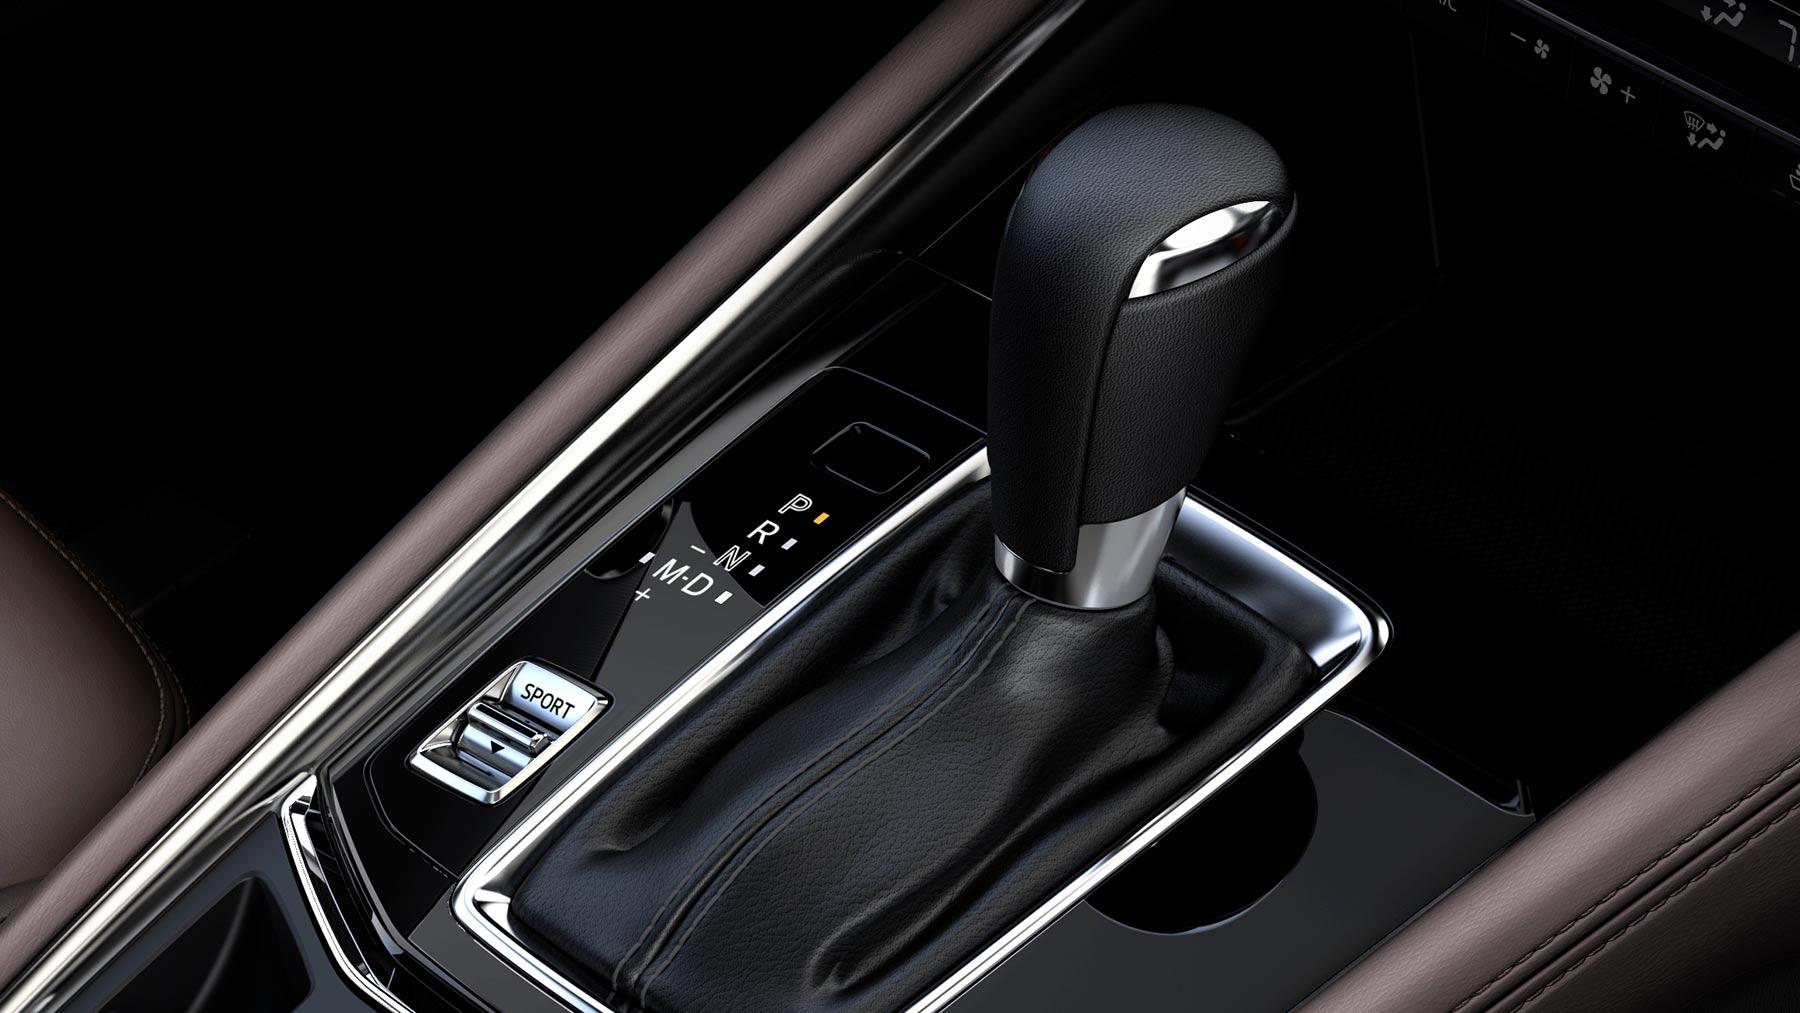 Plentiful Power Options in the Mazda CX-5